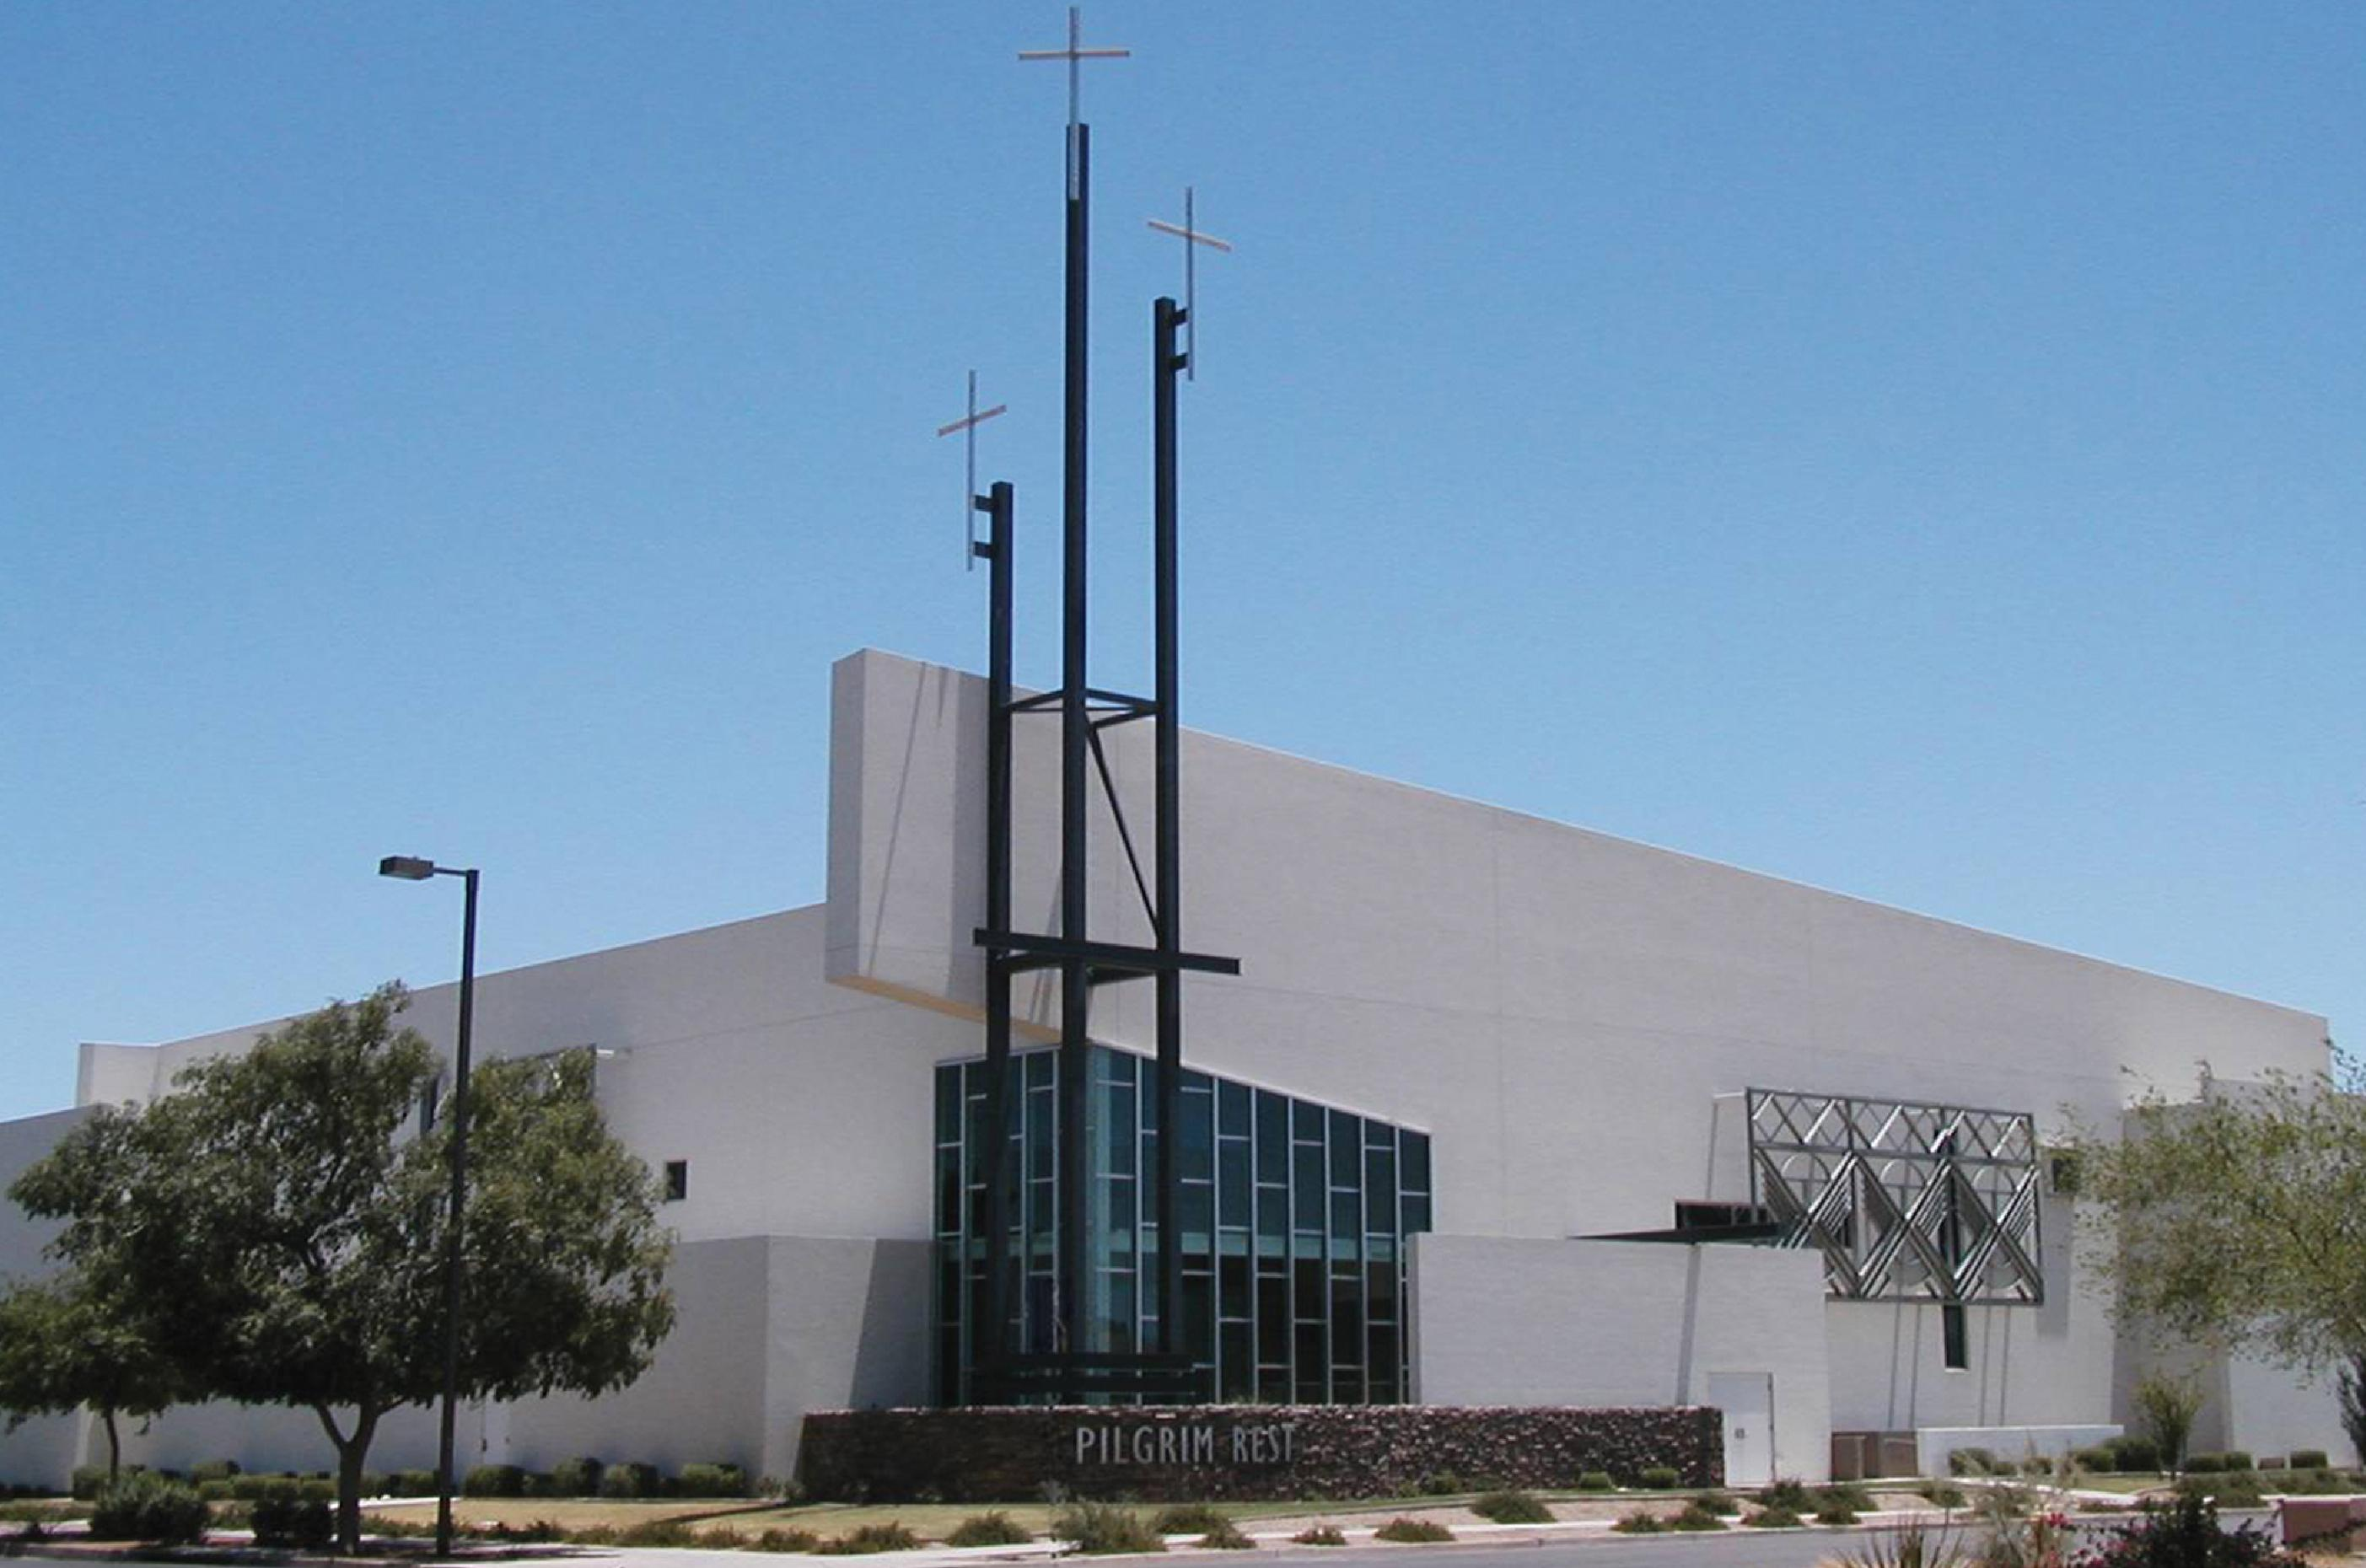 Pilgrim Rest Baptist Church photo